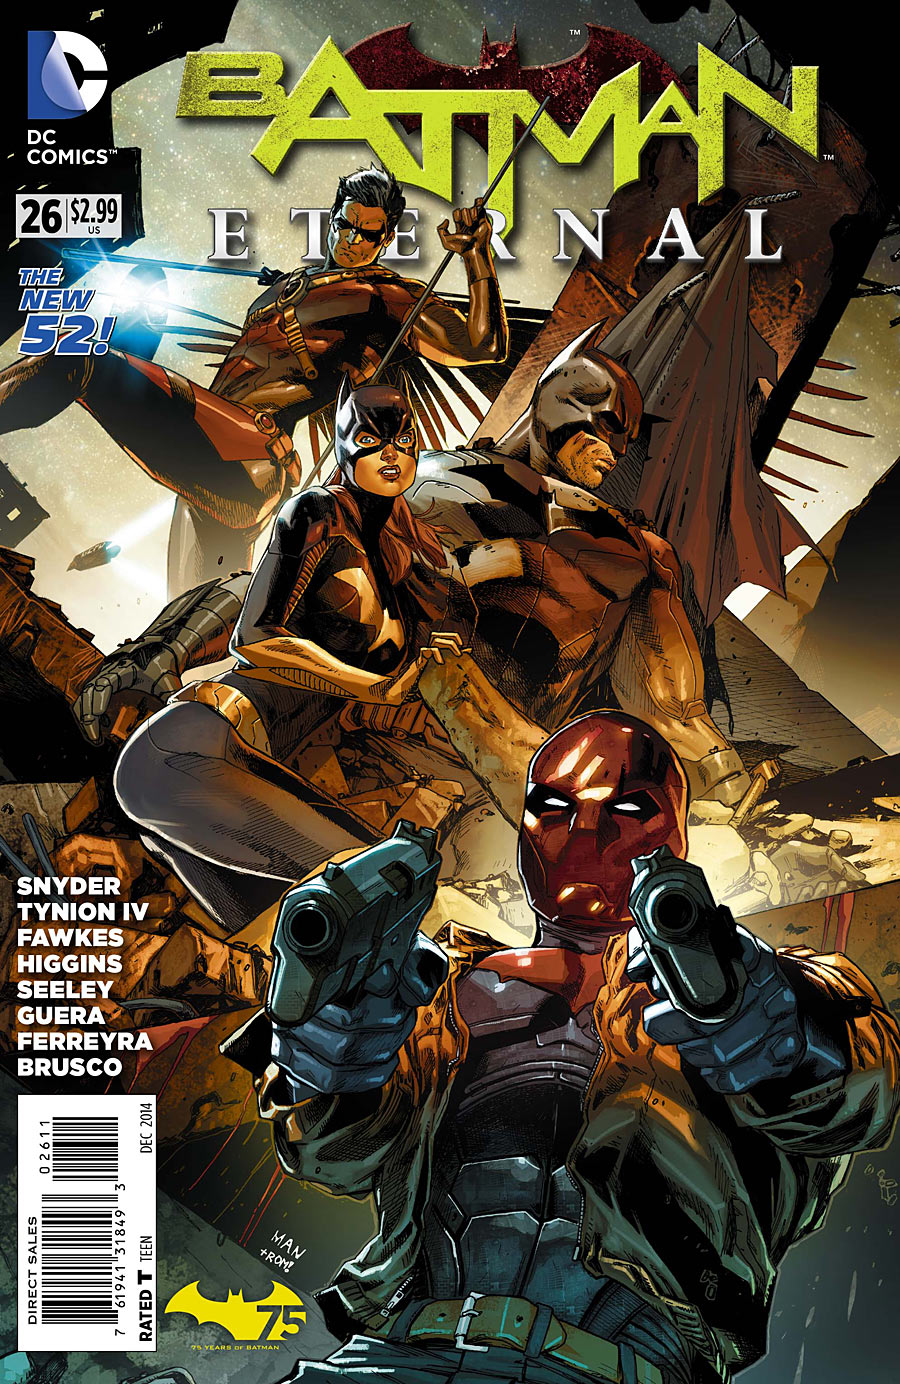 BATMAN ETERNAL #26 SCOTT SNYDER DEC 2014 HUSH RED HOOD DC NEW 52 NM COMIC BOOK 1